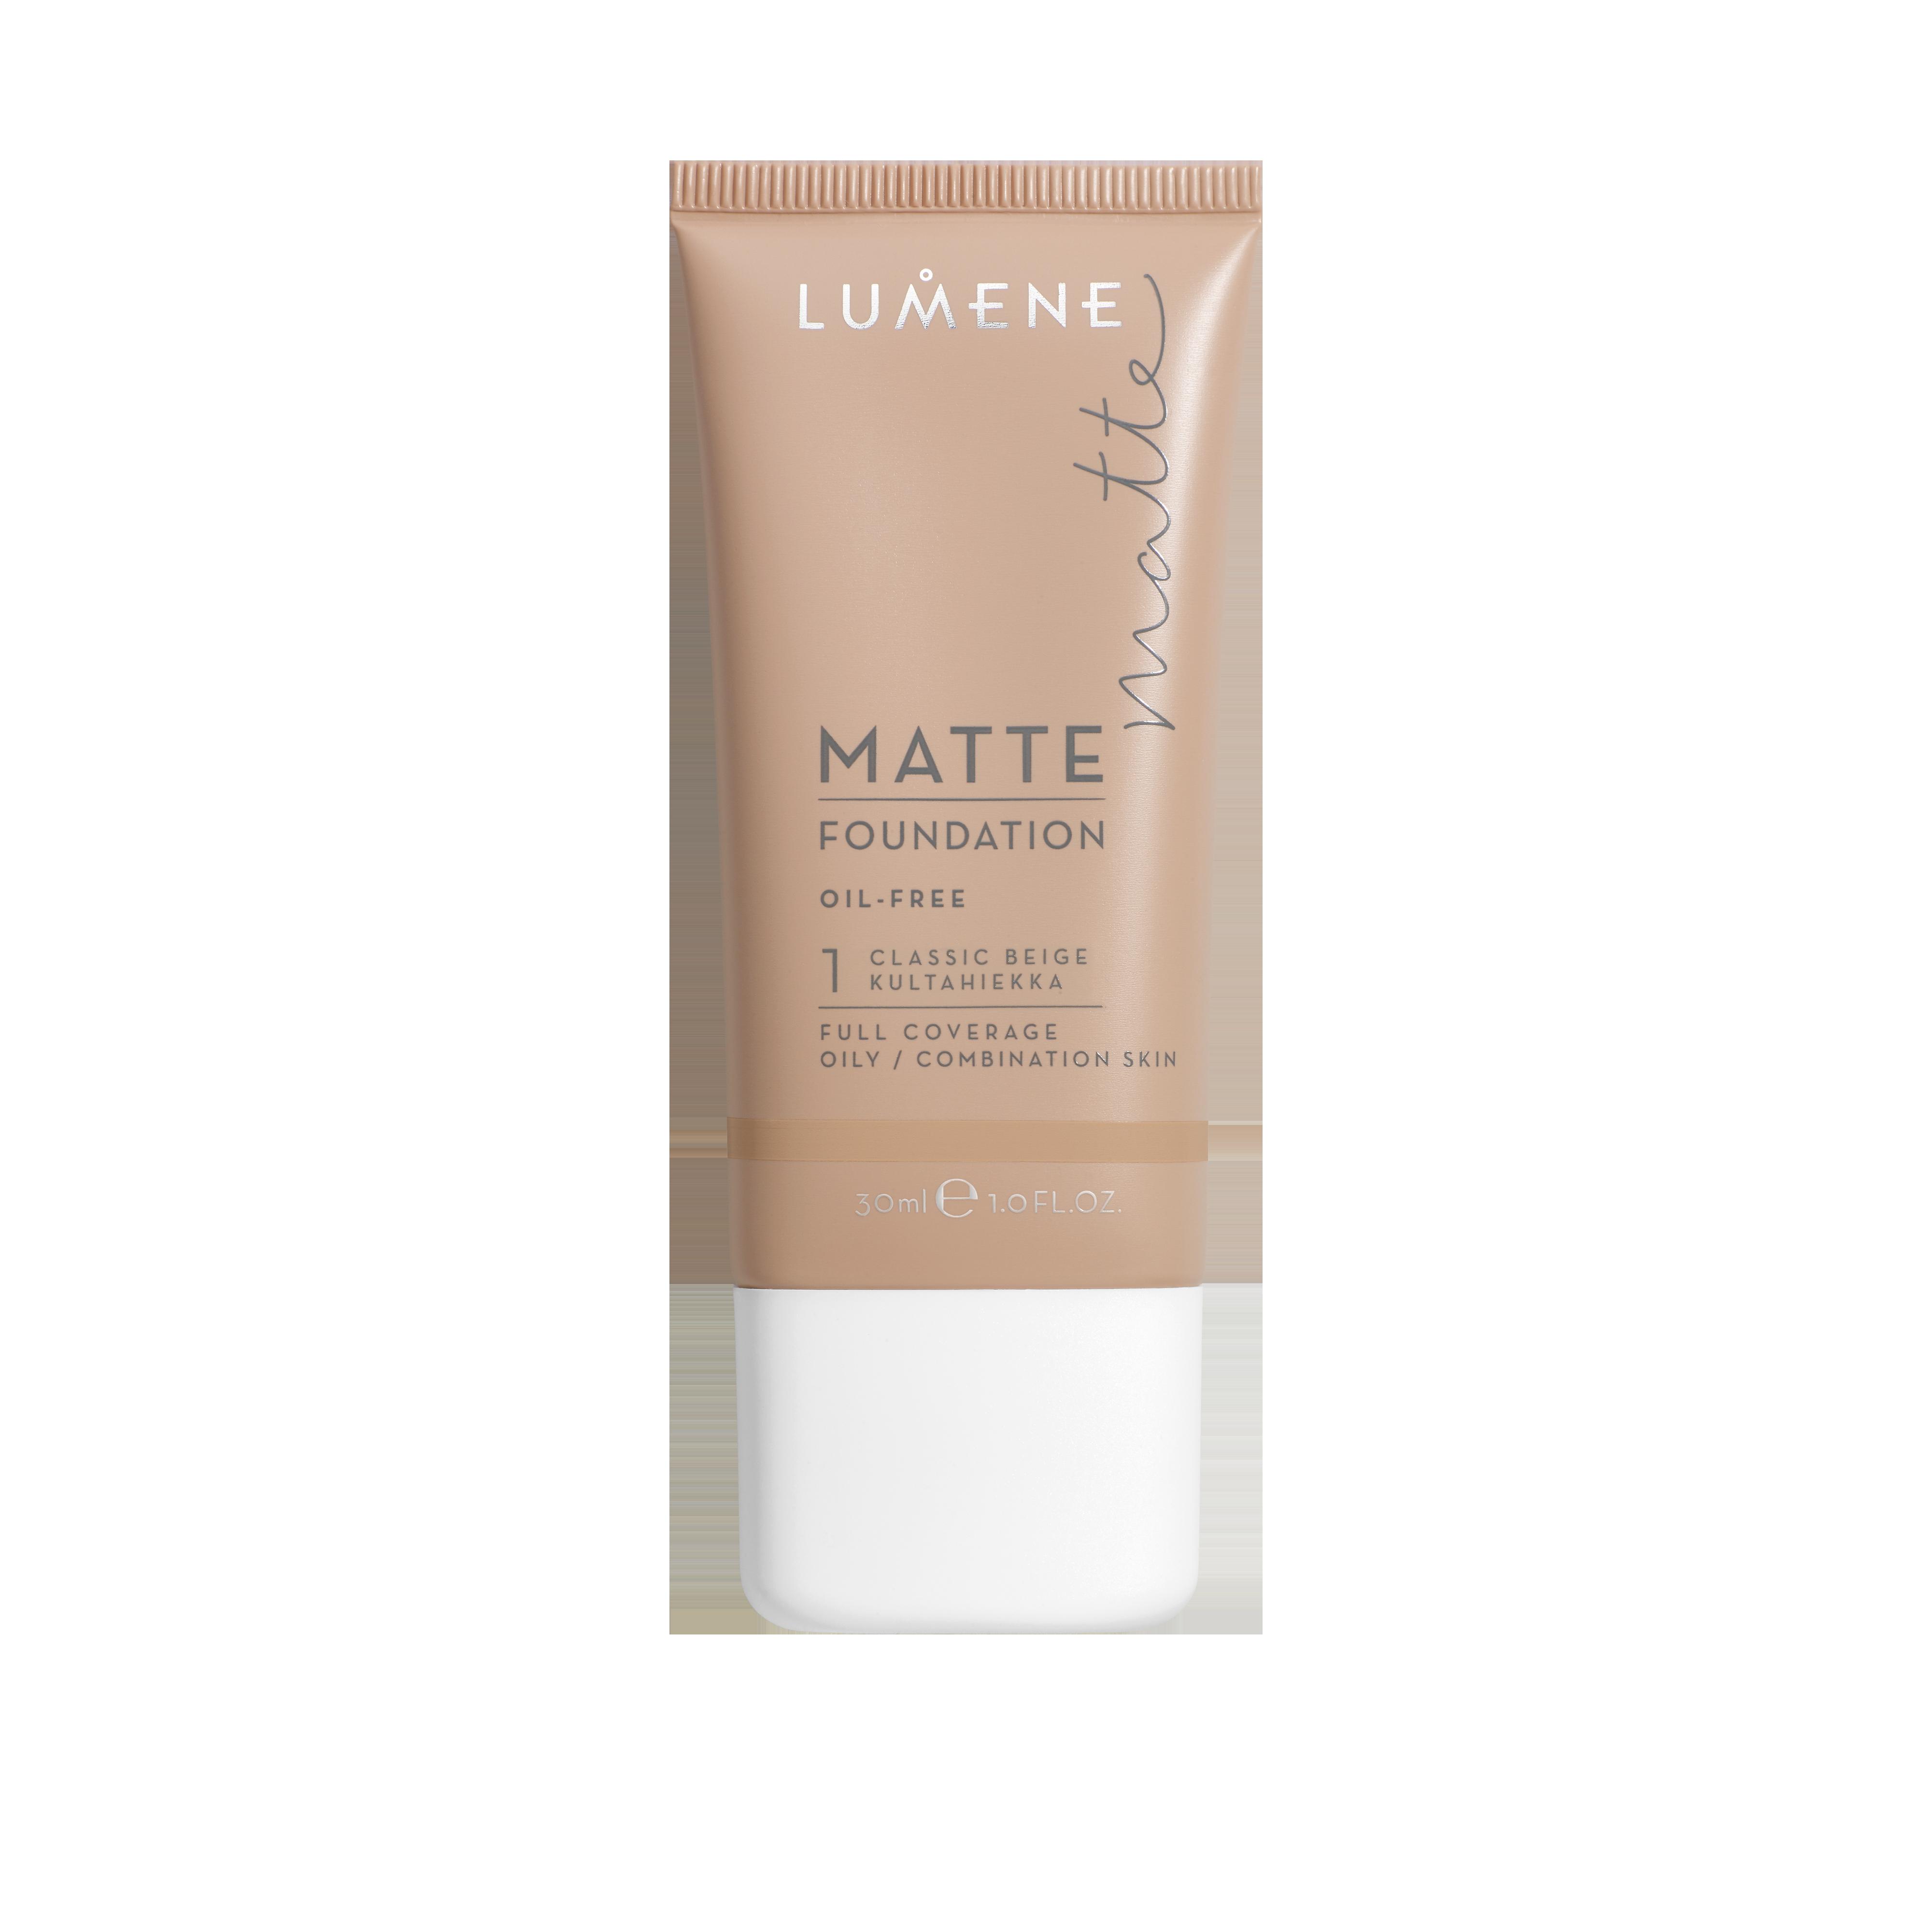 Matte Foundation 1 Classic Beige